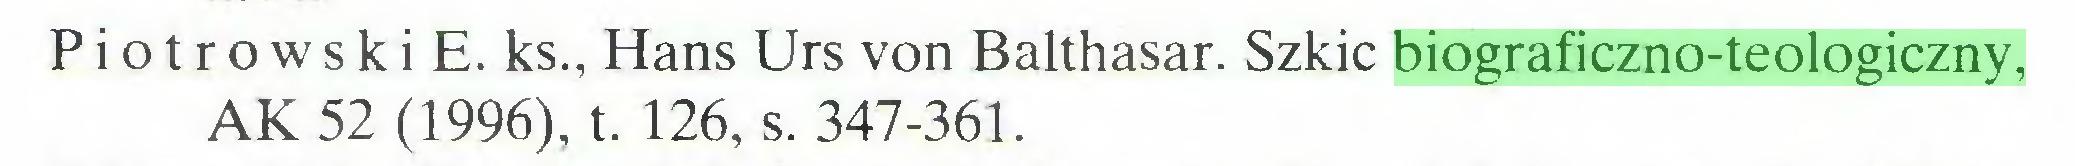 (...) Piotrowski E. ks., Hans Urs von Balthasar. Szkic biograficzno-teologiczny, AK 52 (1996), t. 126, s. 347-361...